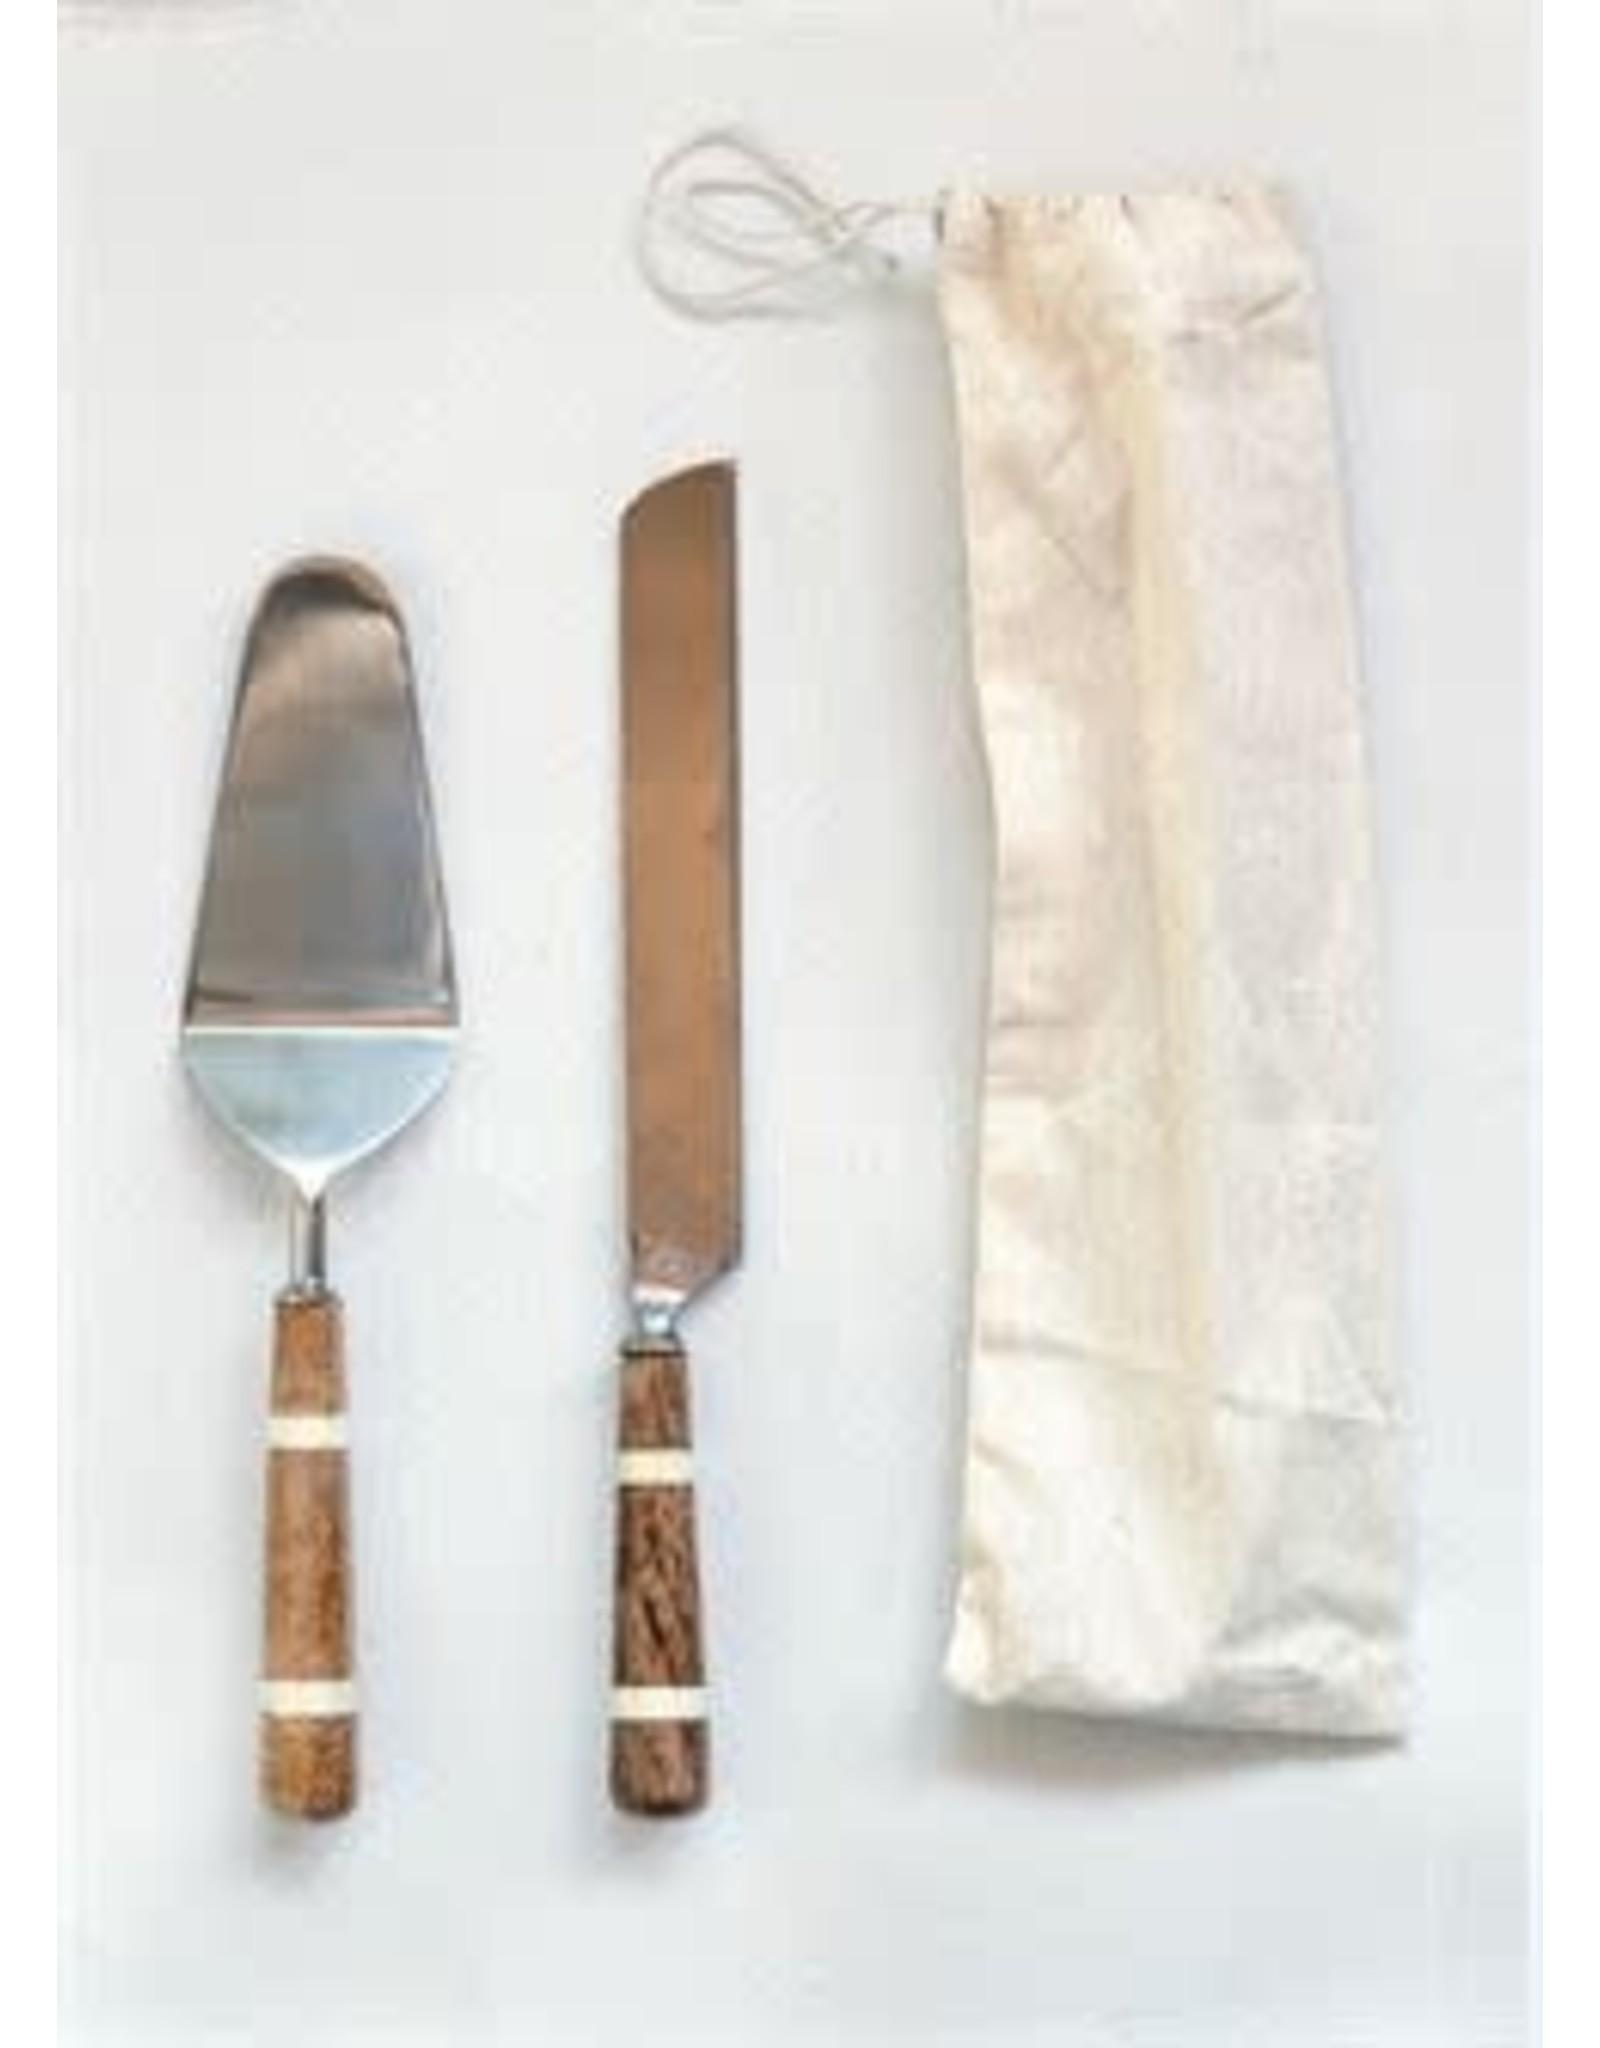 Cake Knife & Server w/ Wood & Horn Handle S/2